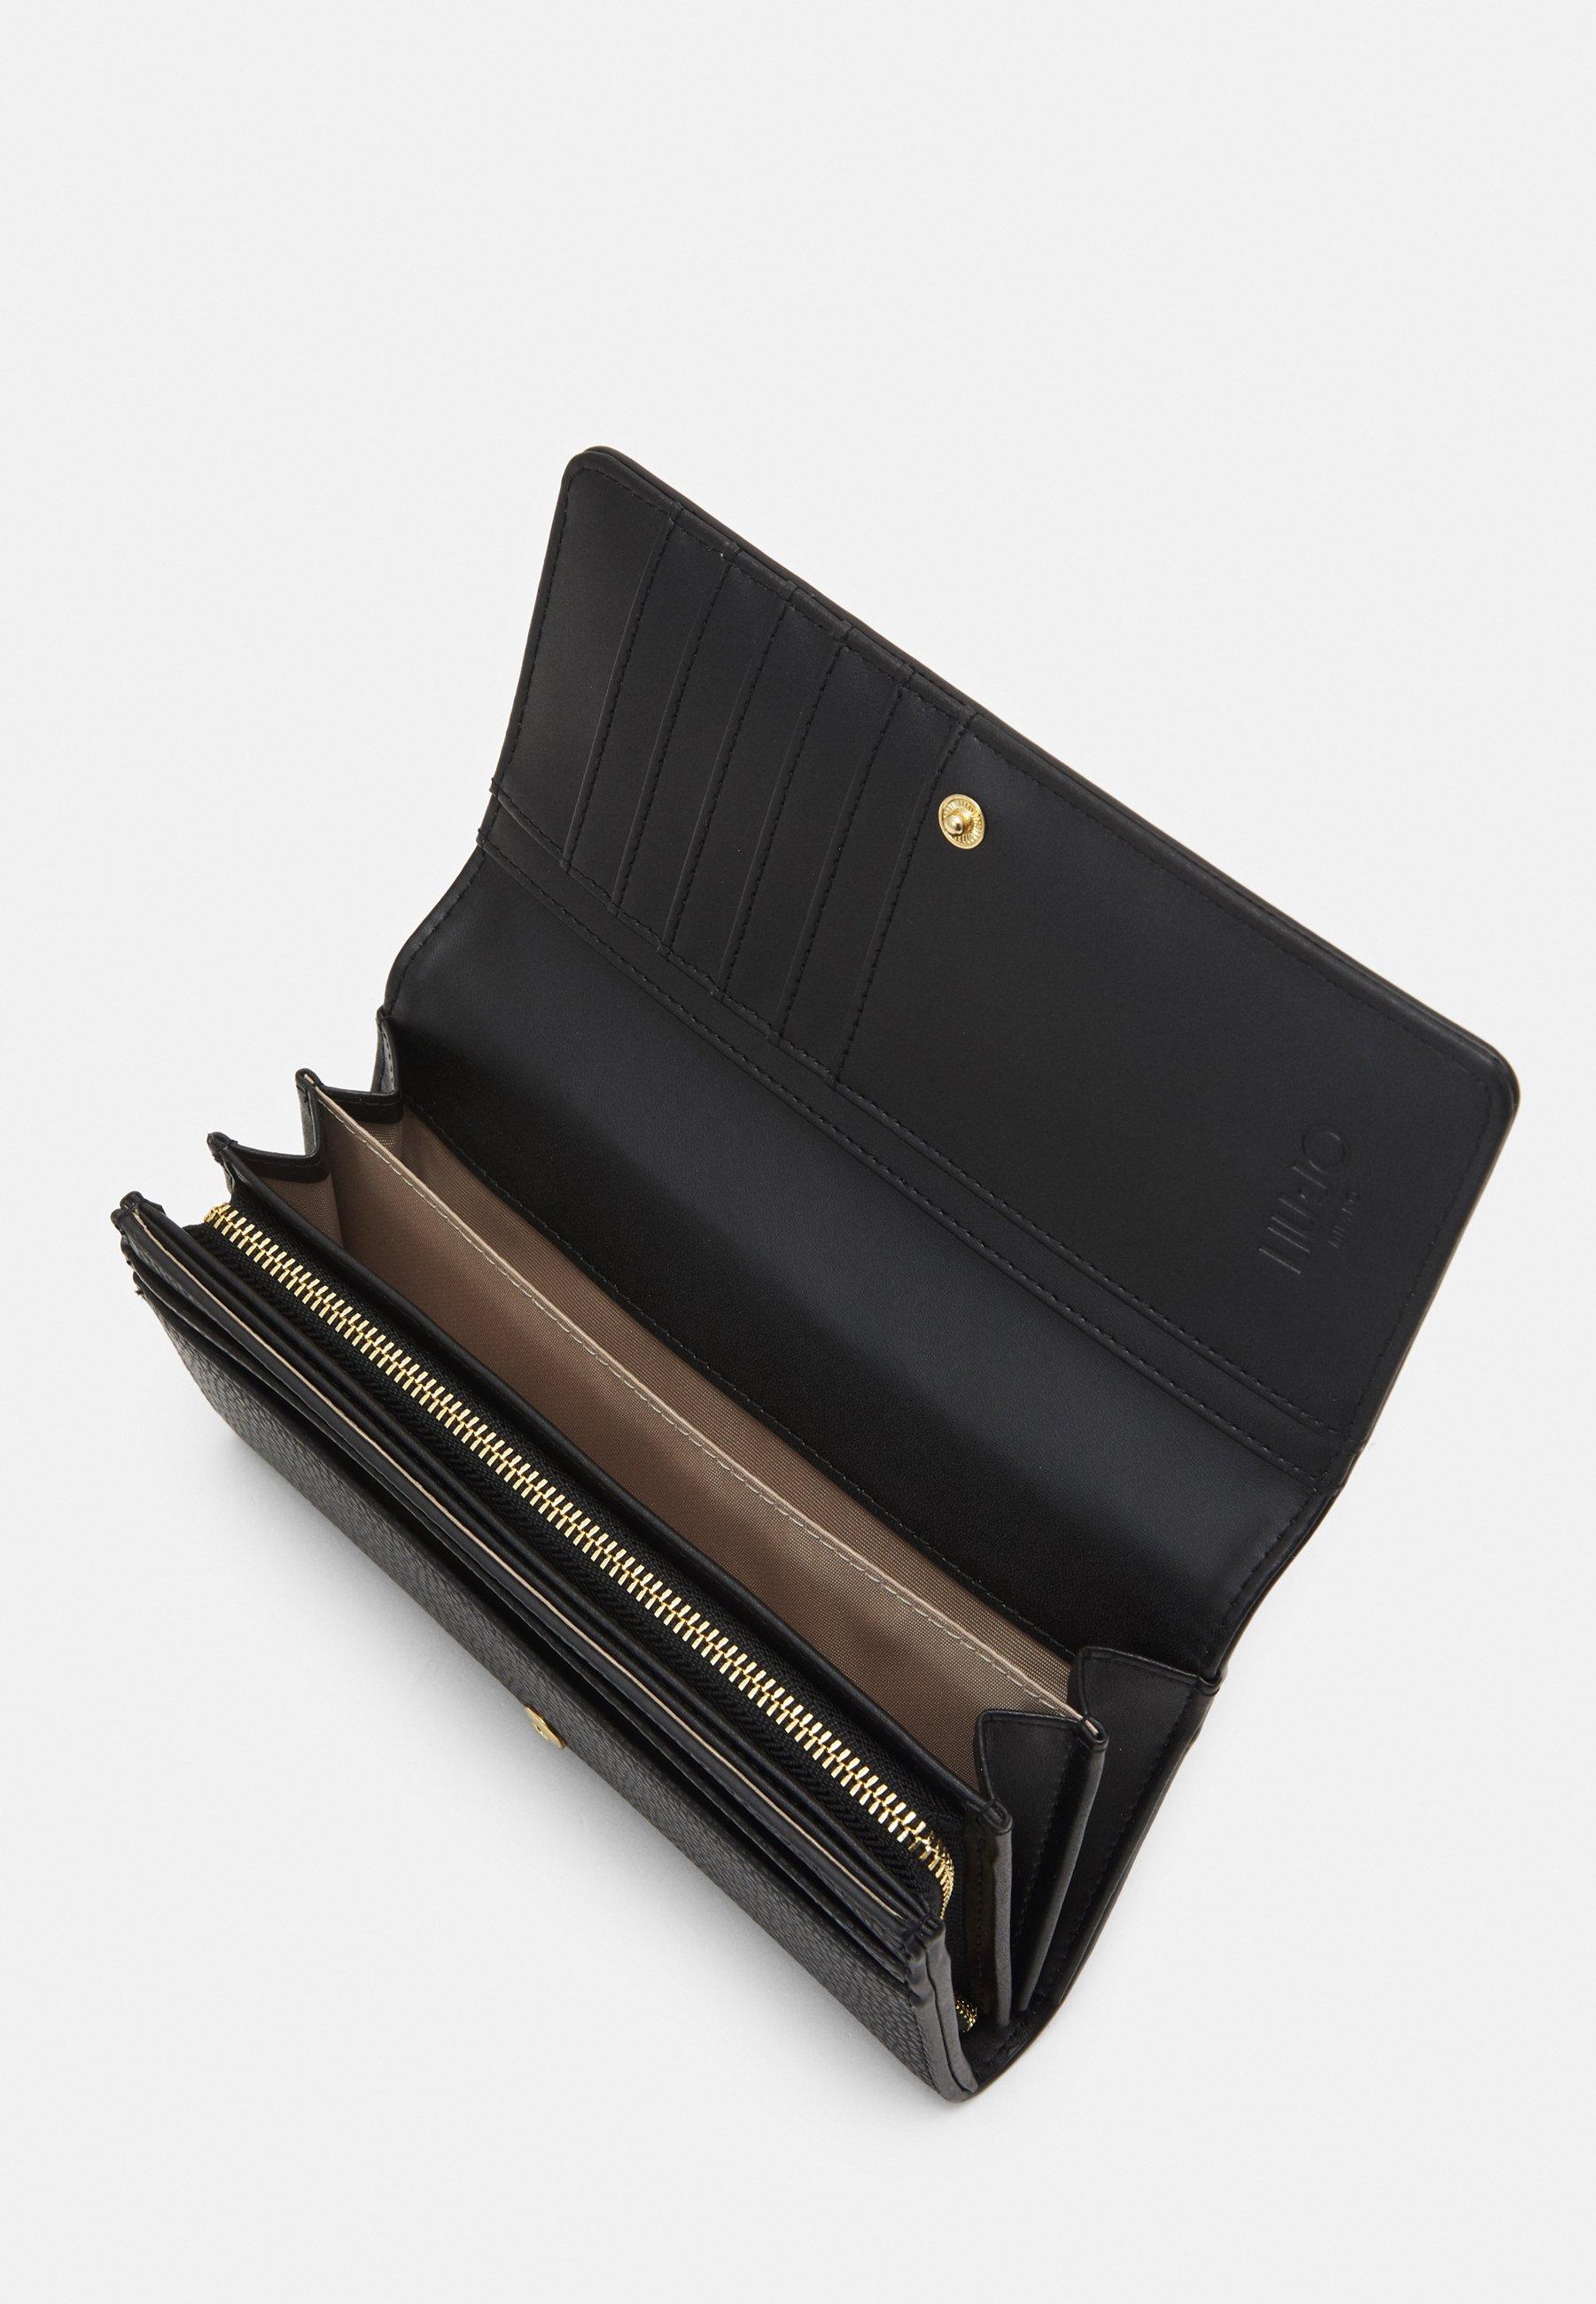 portafoglio lace liu jo LIU JO | Portafogli | AA1252E002722222